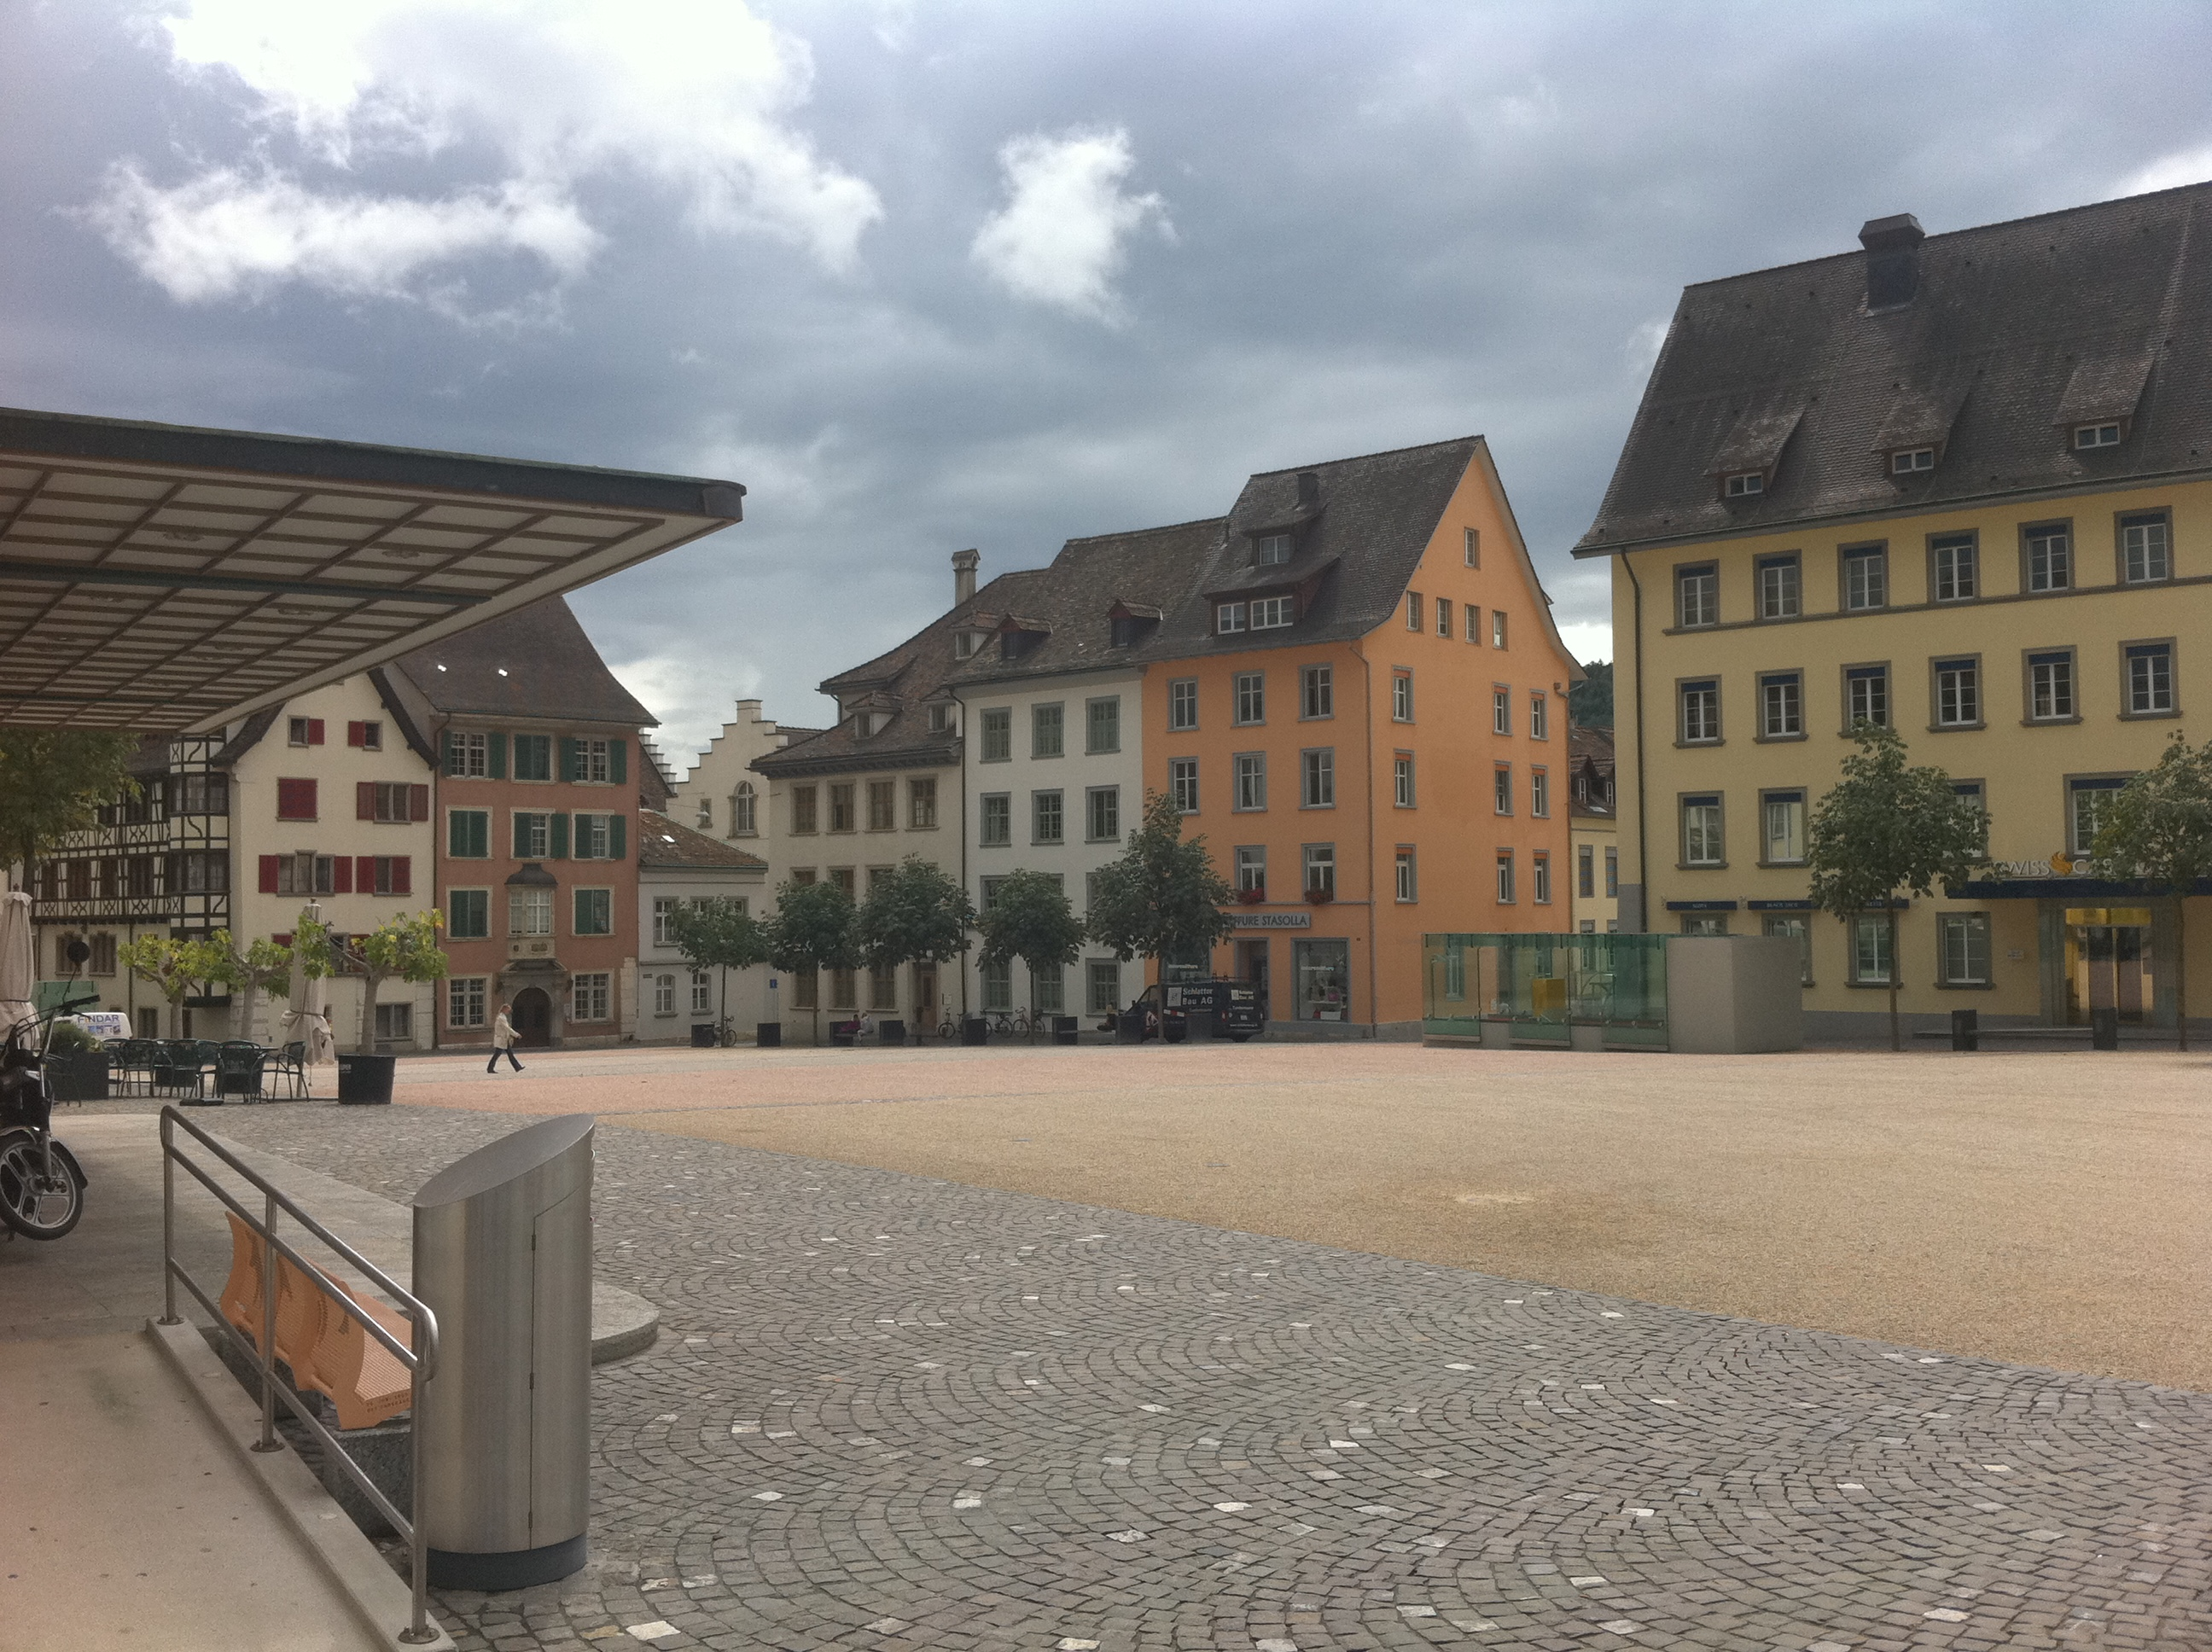 Herrenacker Schaffhausen